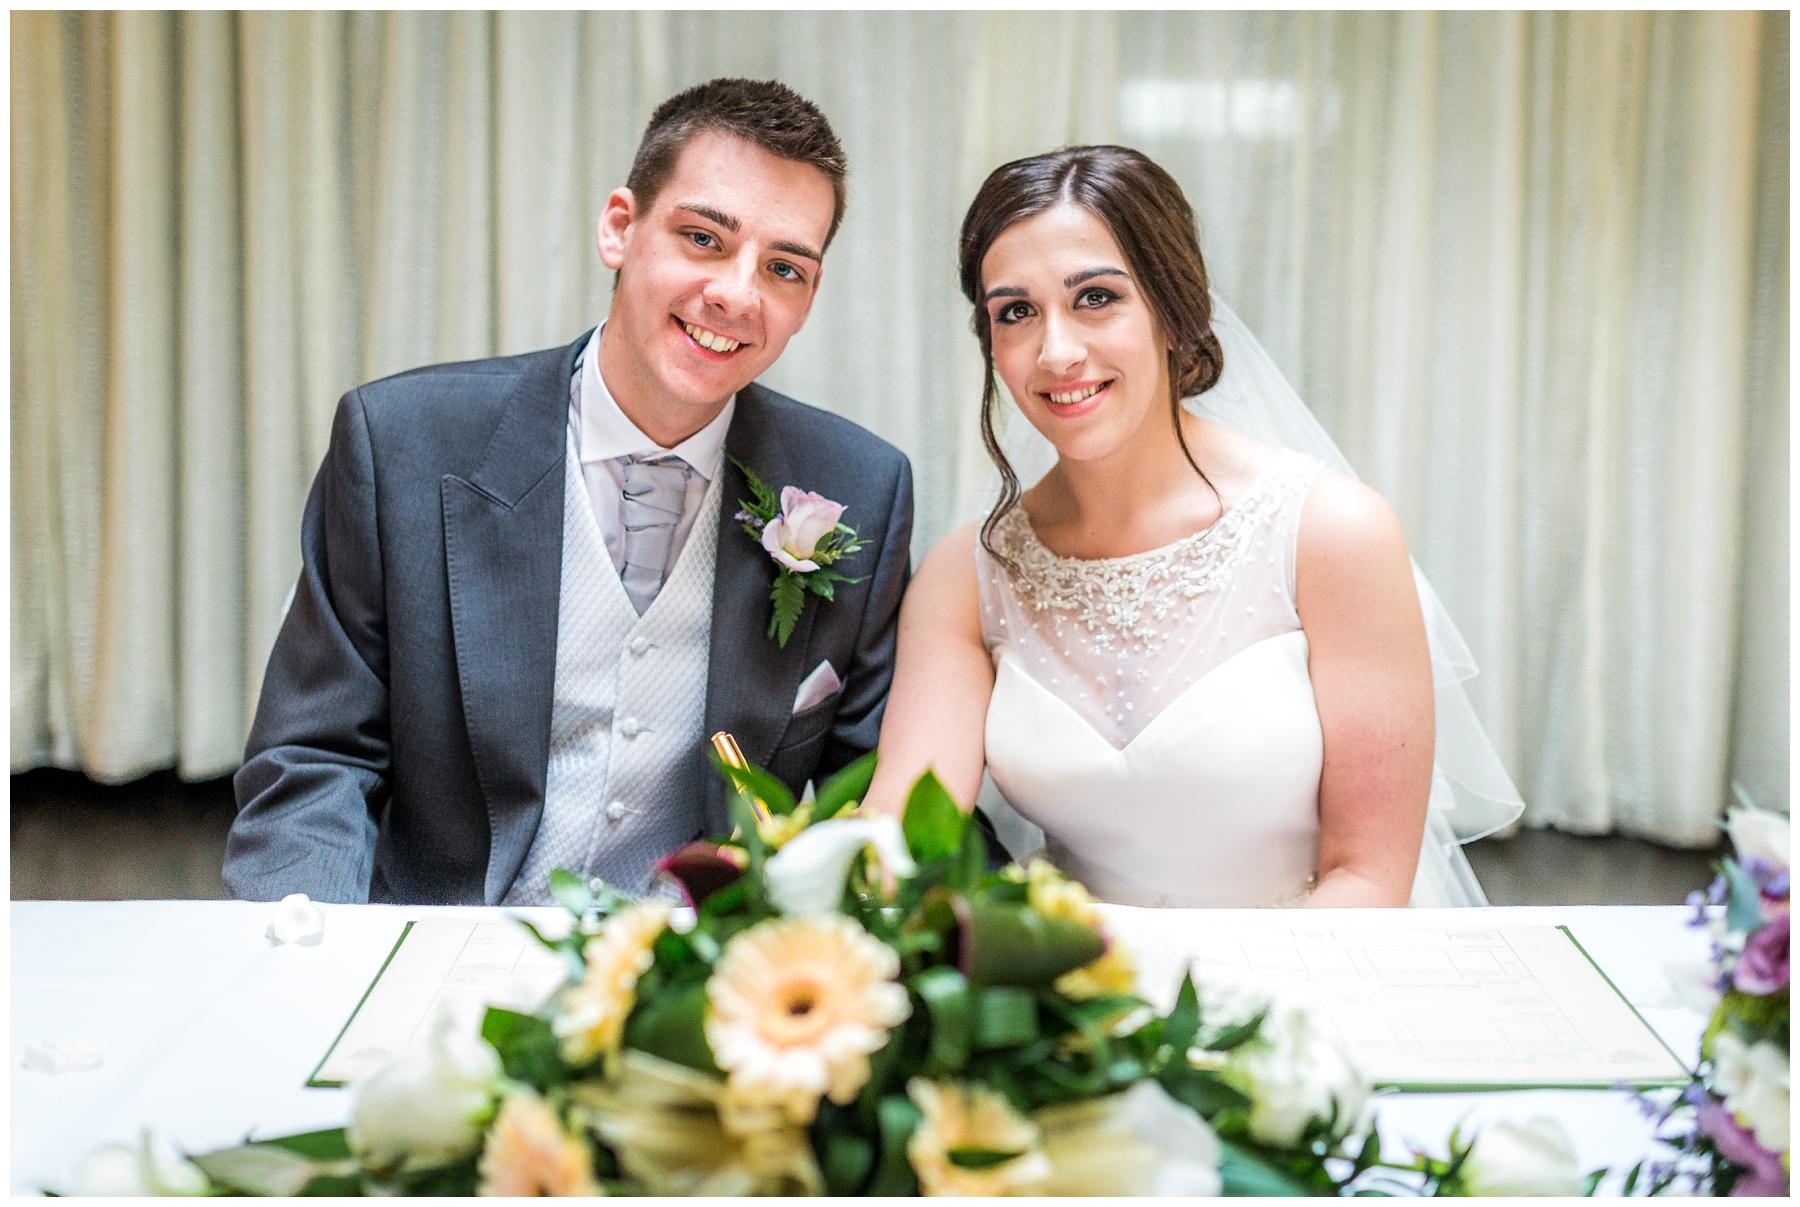 holland-hall-wedding-photography-becky-jason_0021.jpg